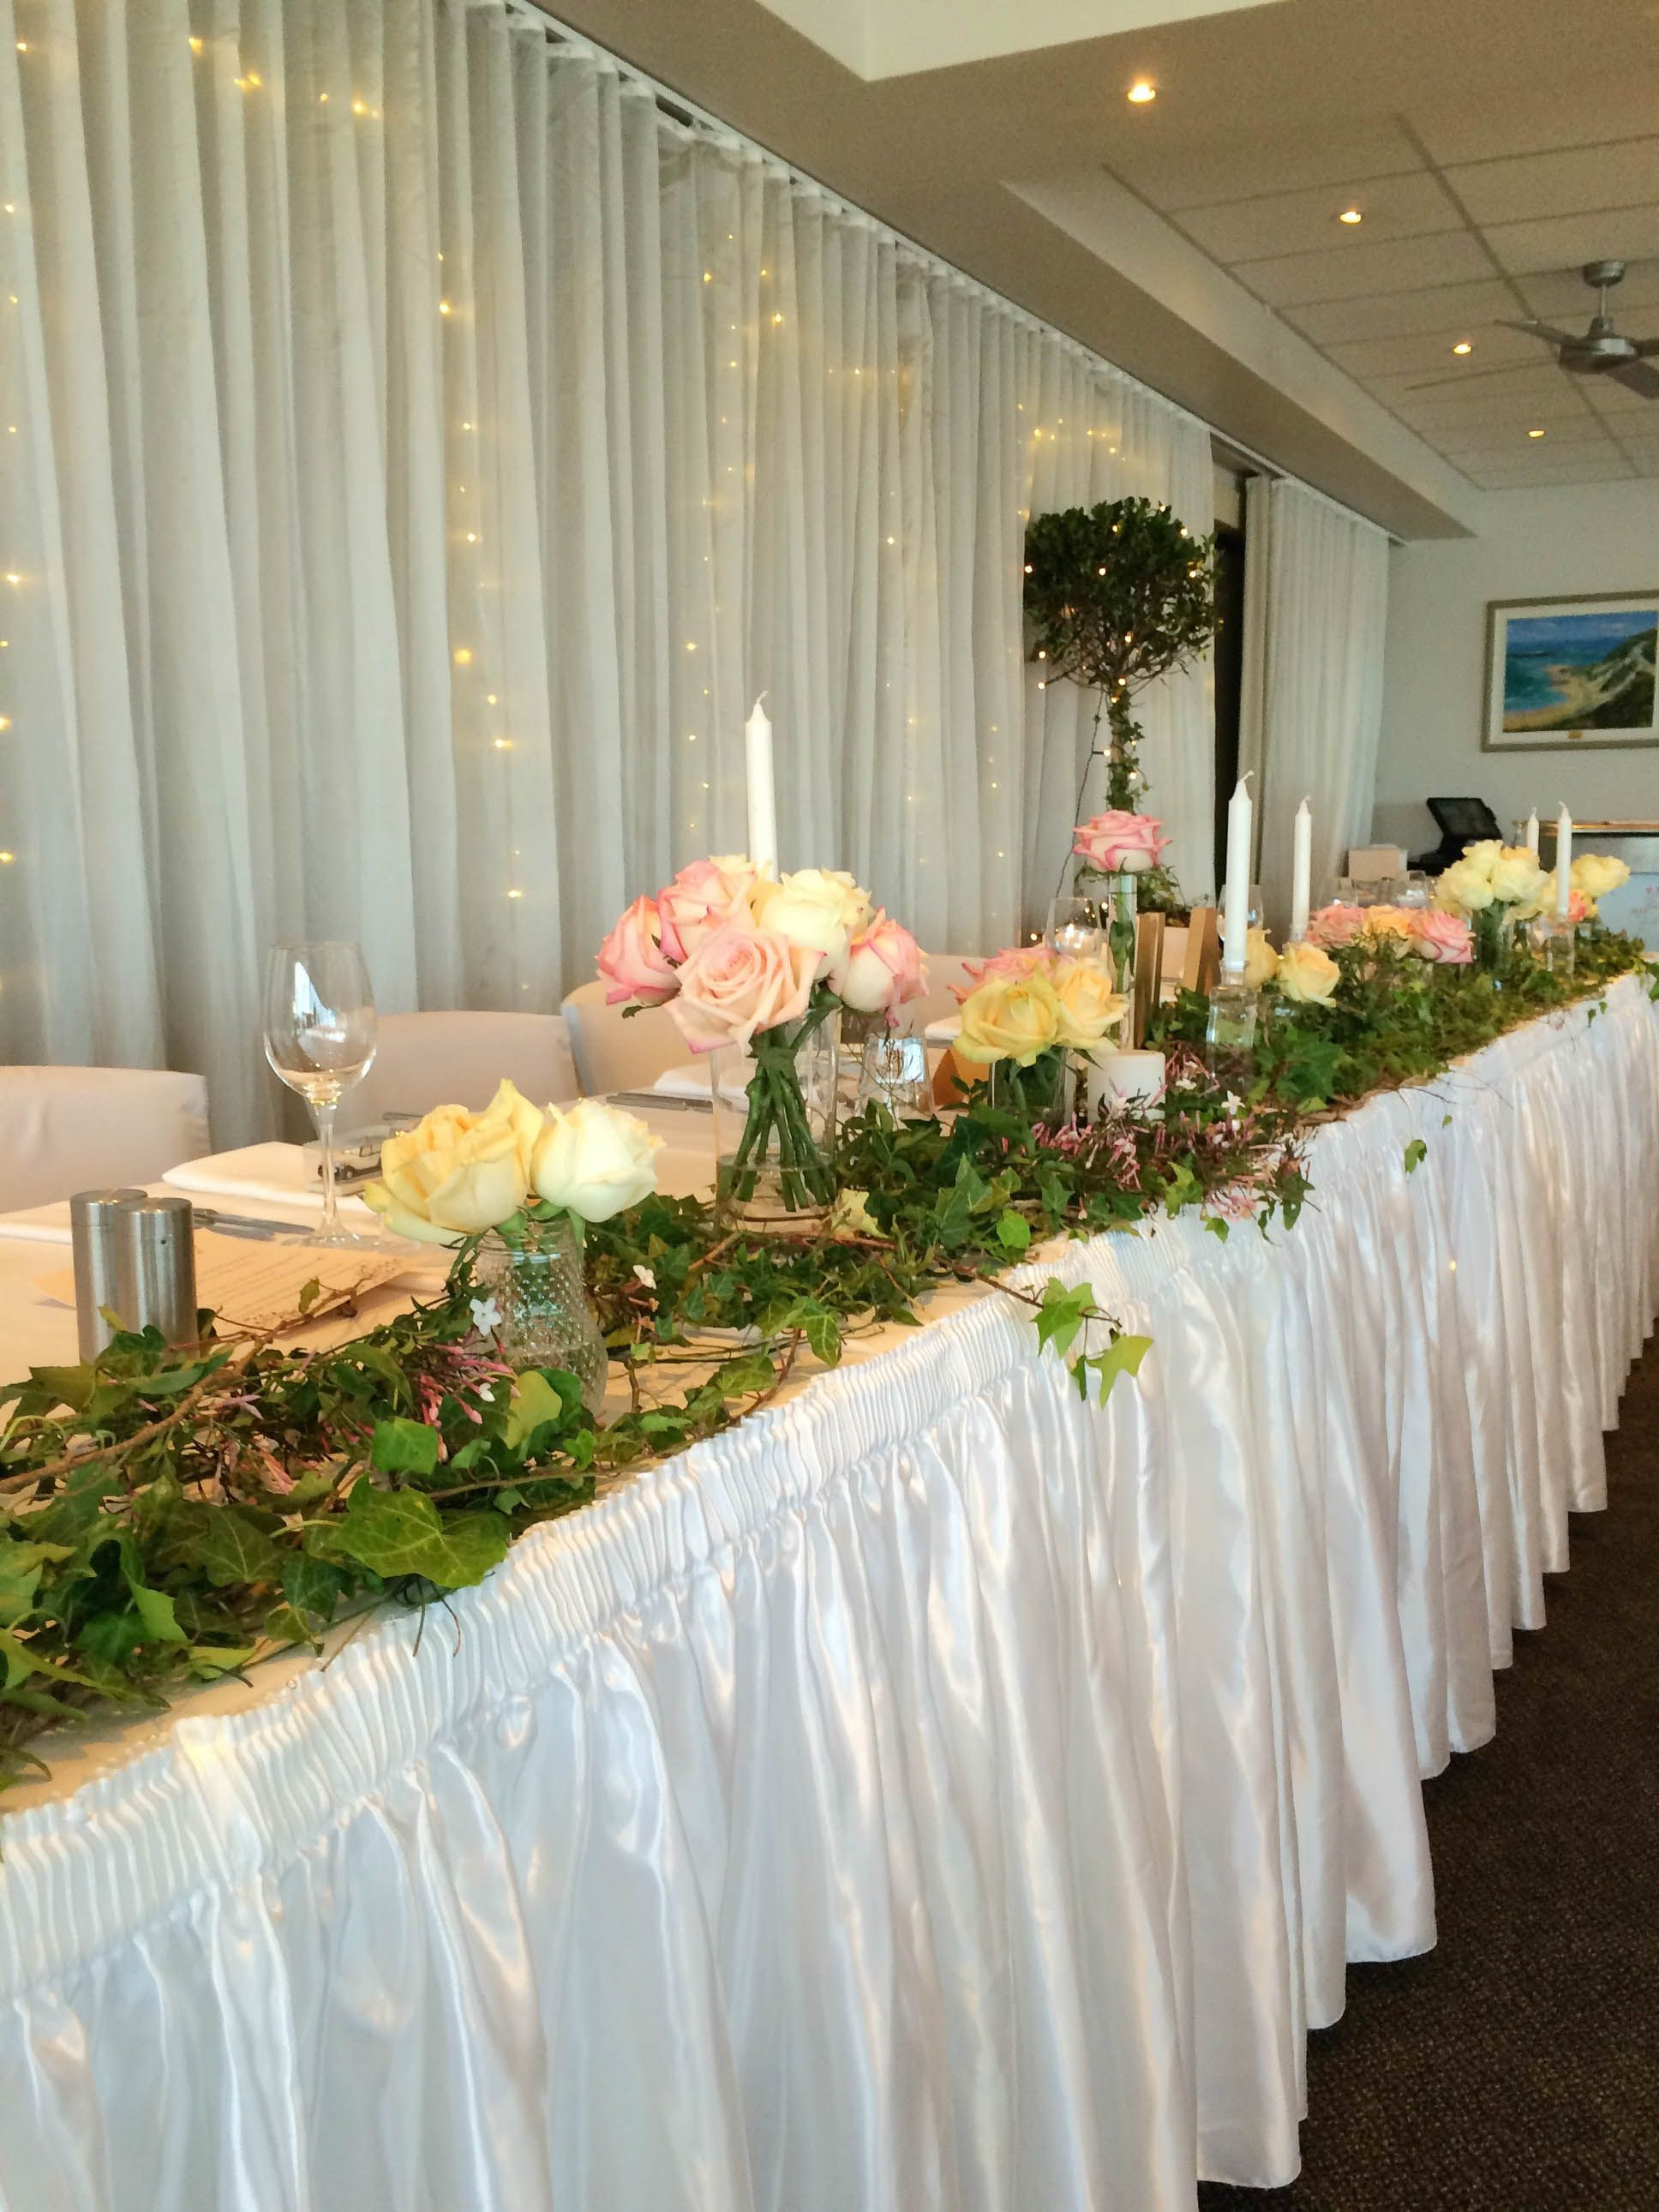 the-wedding-decorator-sydney-bridal-table-arrangements.jpg